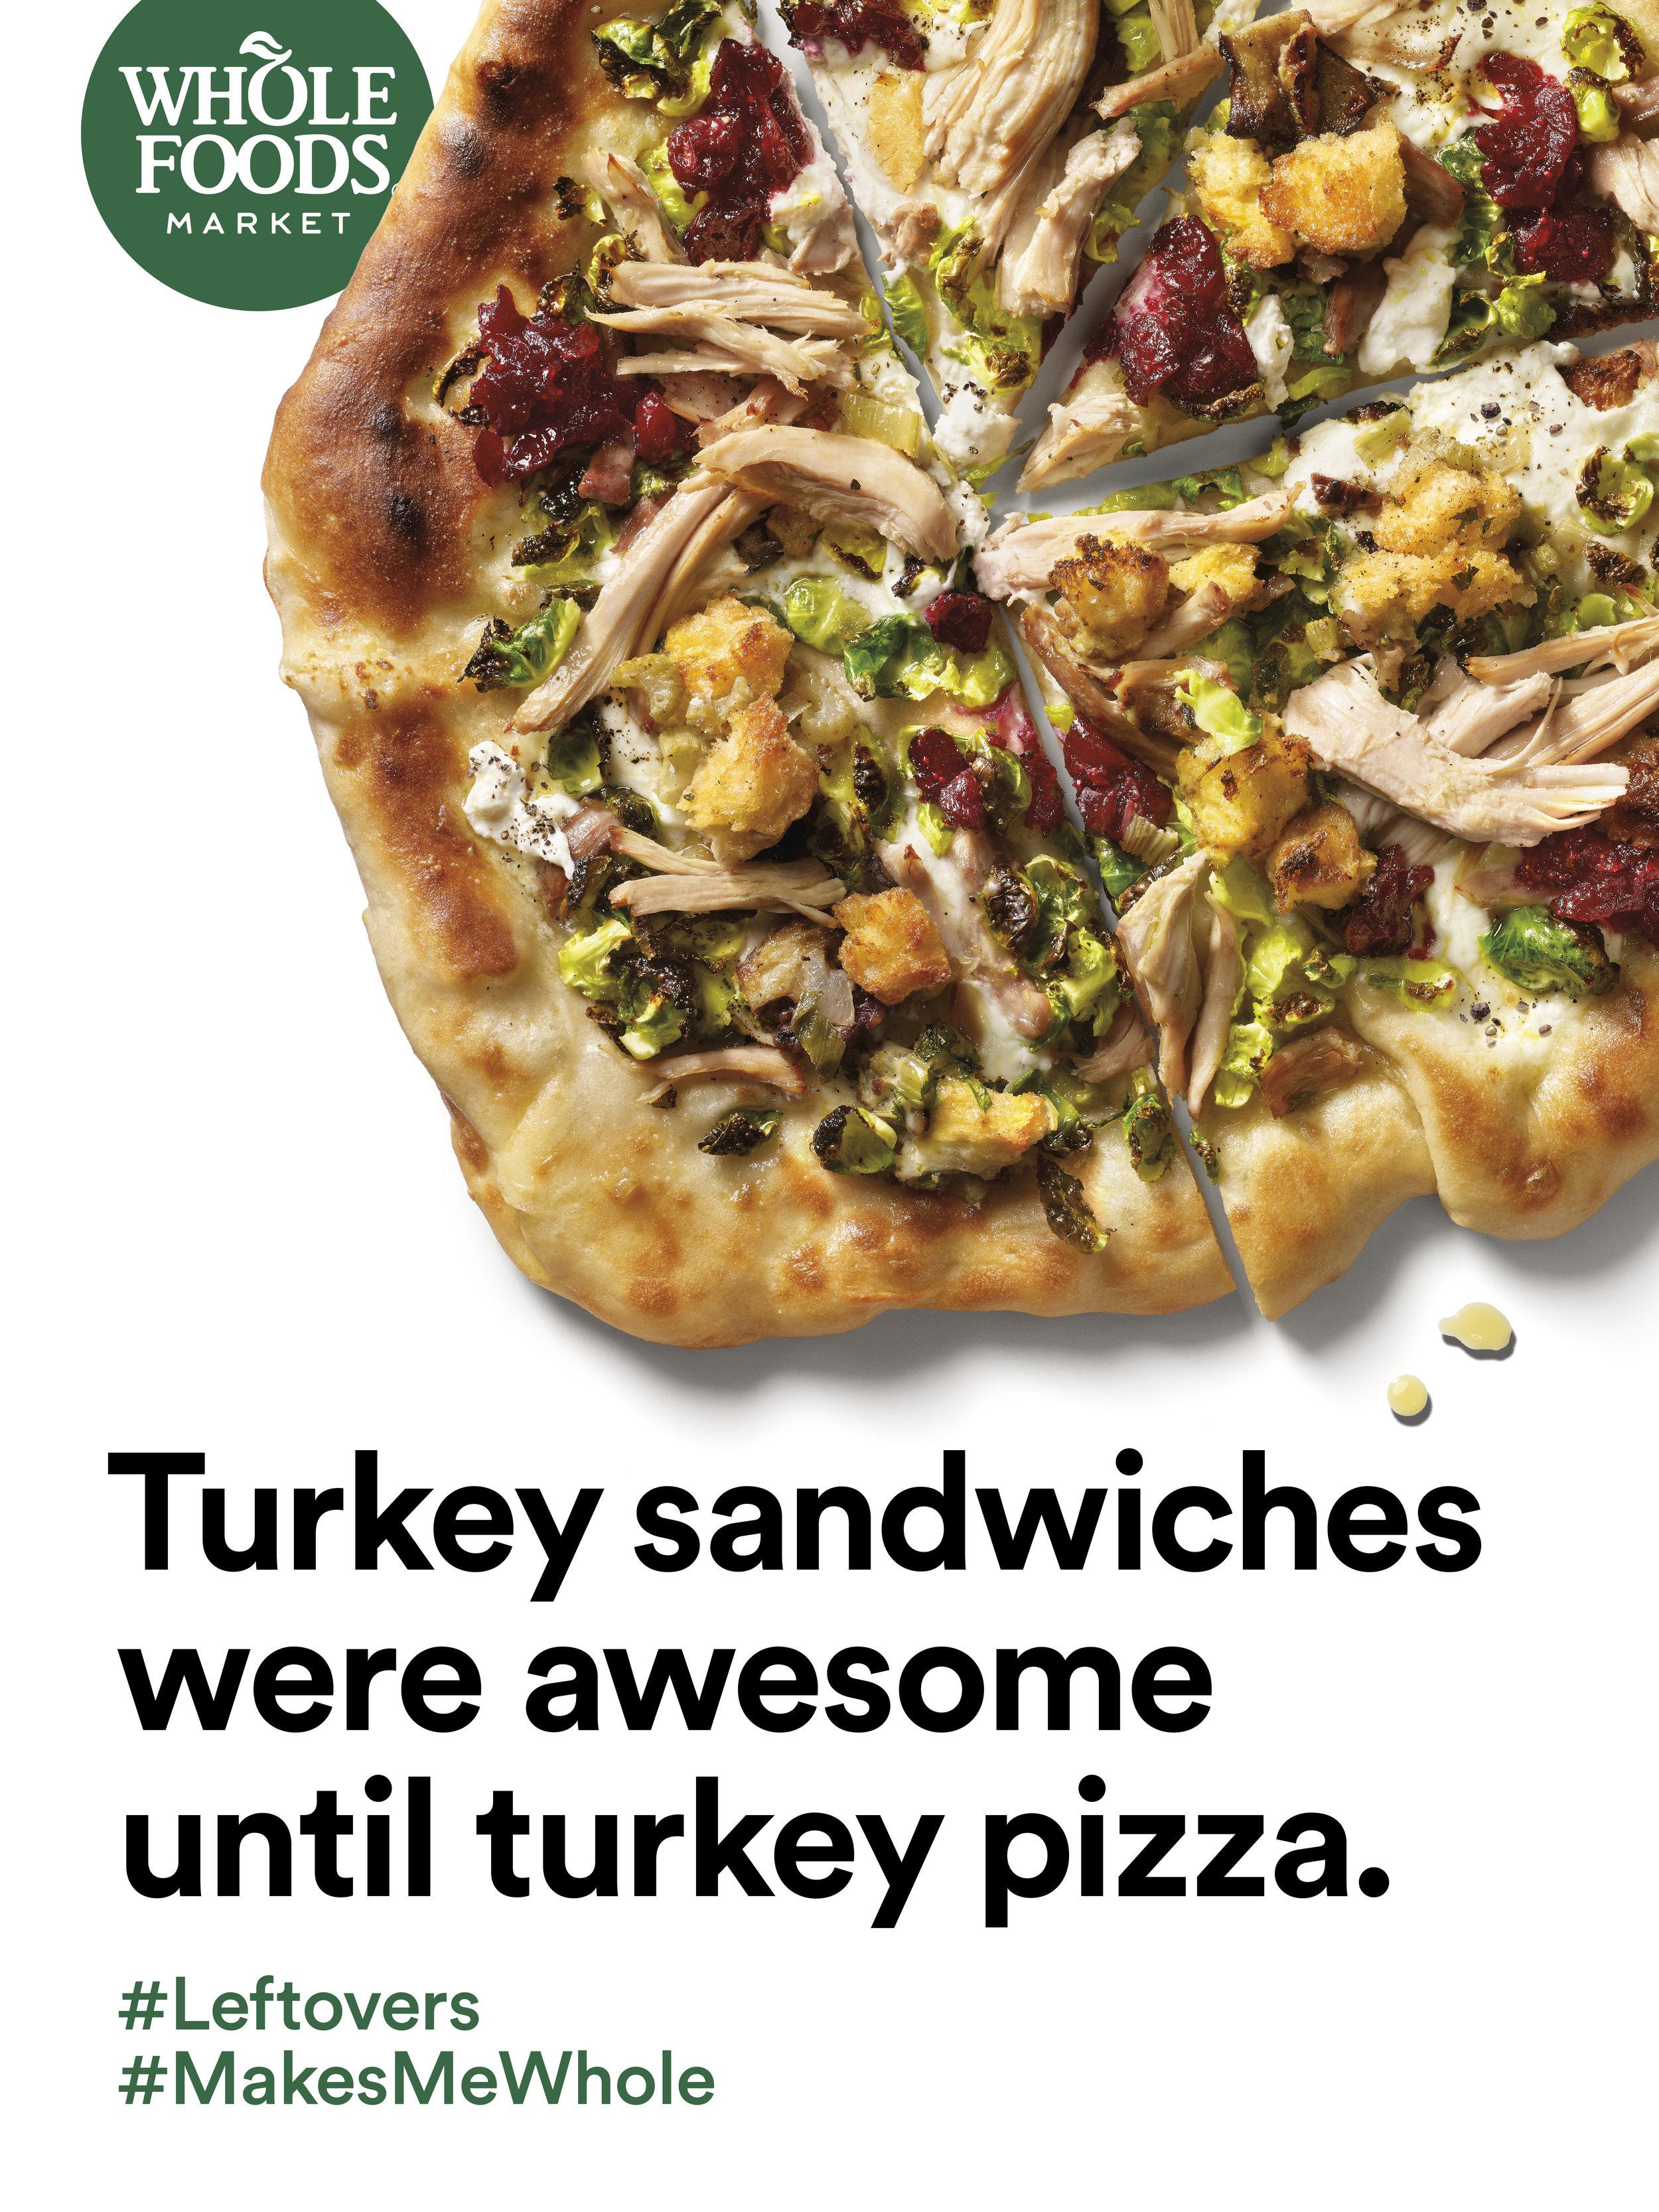 WFM_Harvest_Posters_2018_36x48_TurkeyPizza.jpg